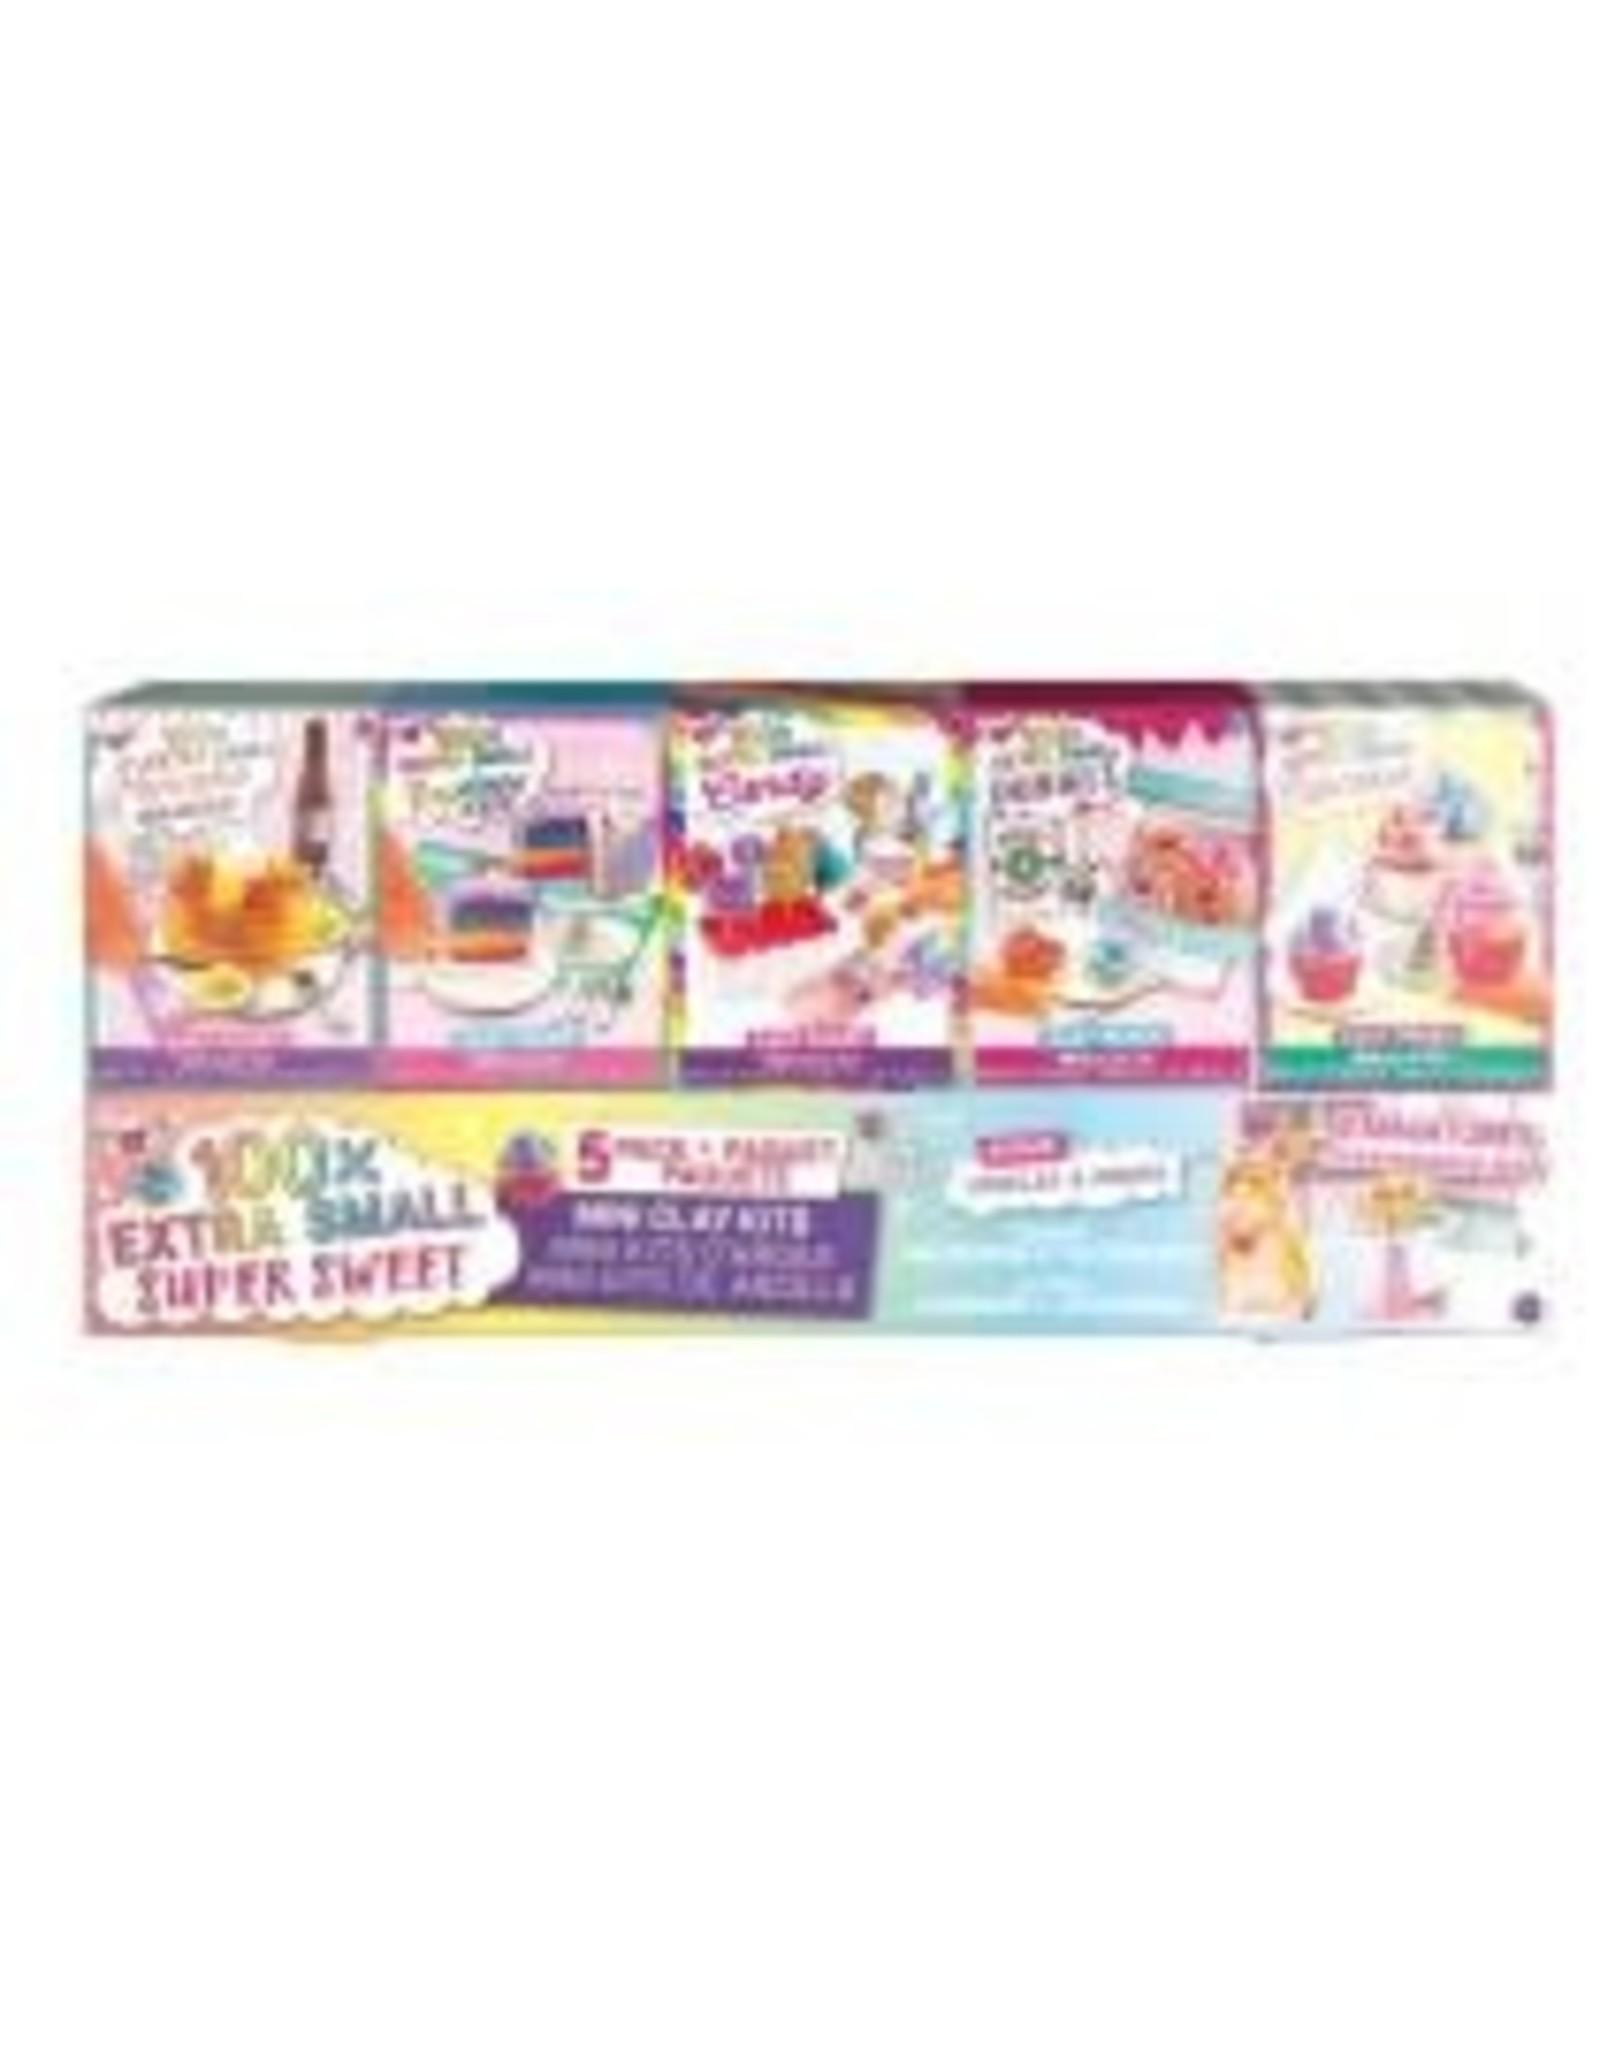 Fashion Angels 100% Extra Small Super Sweet Mini Clay Kits 5pk.